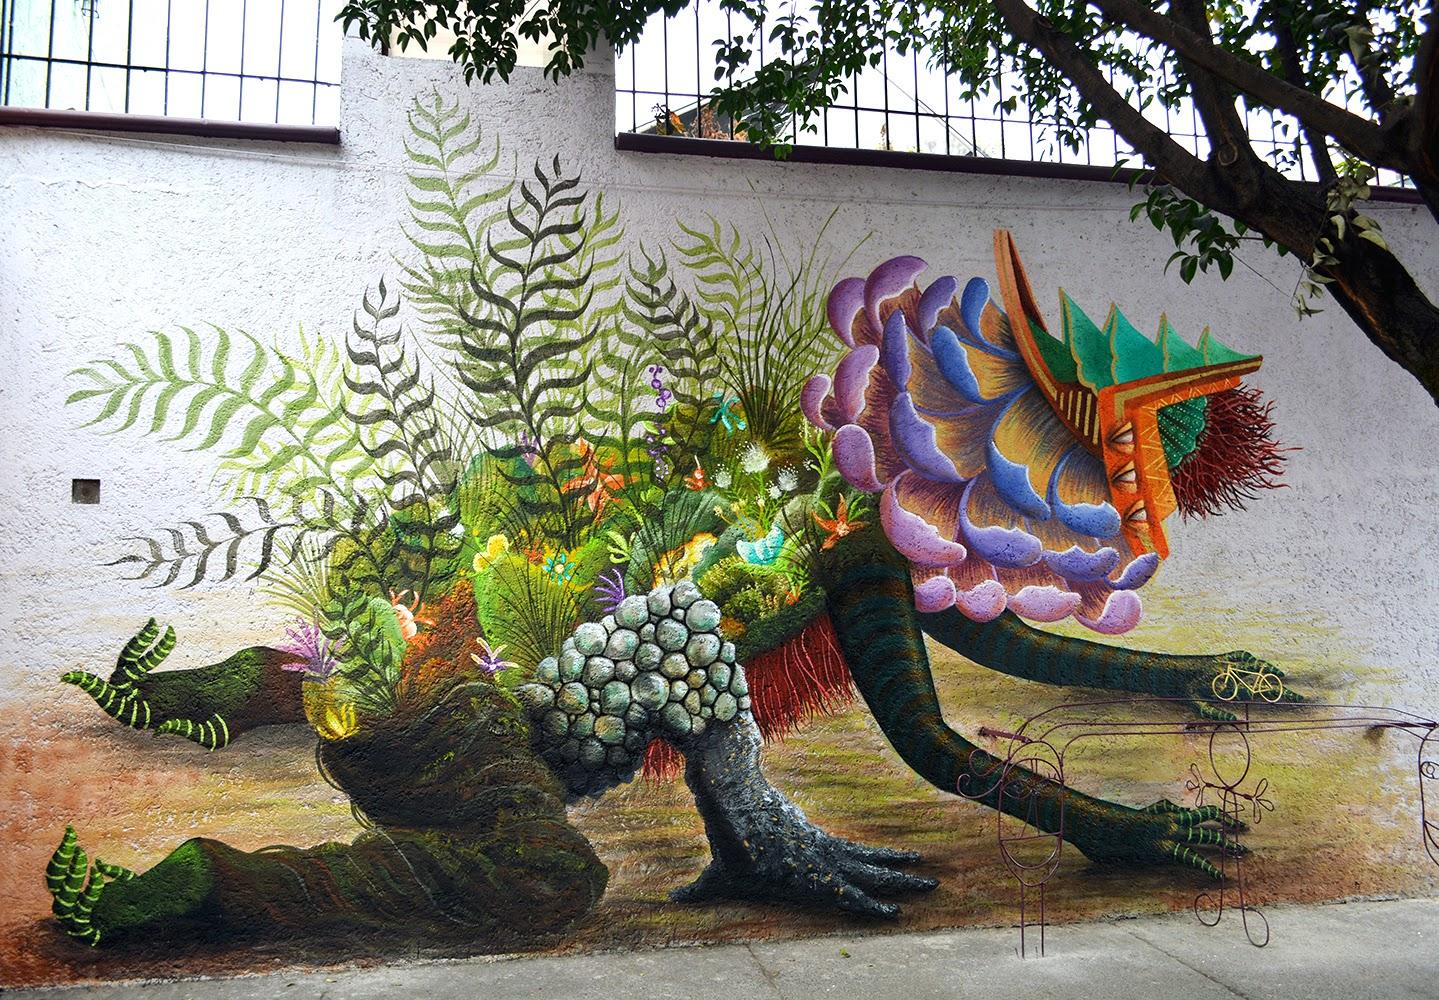 Curiot New Street Art Piece - Mexico City